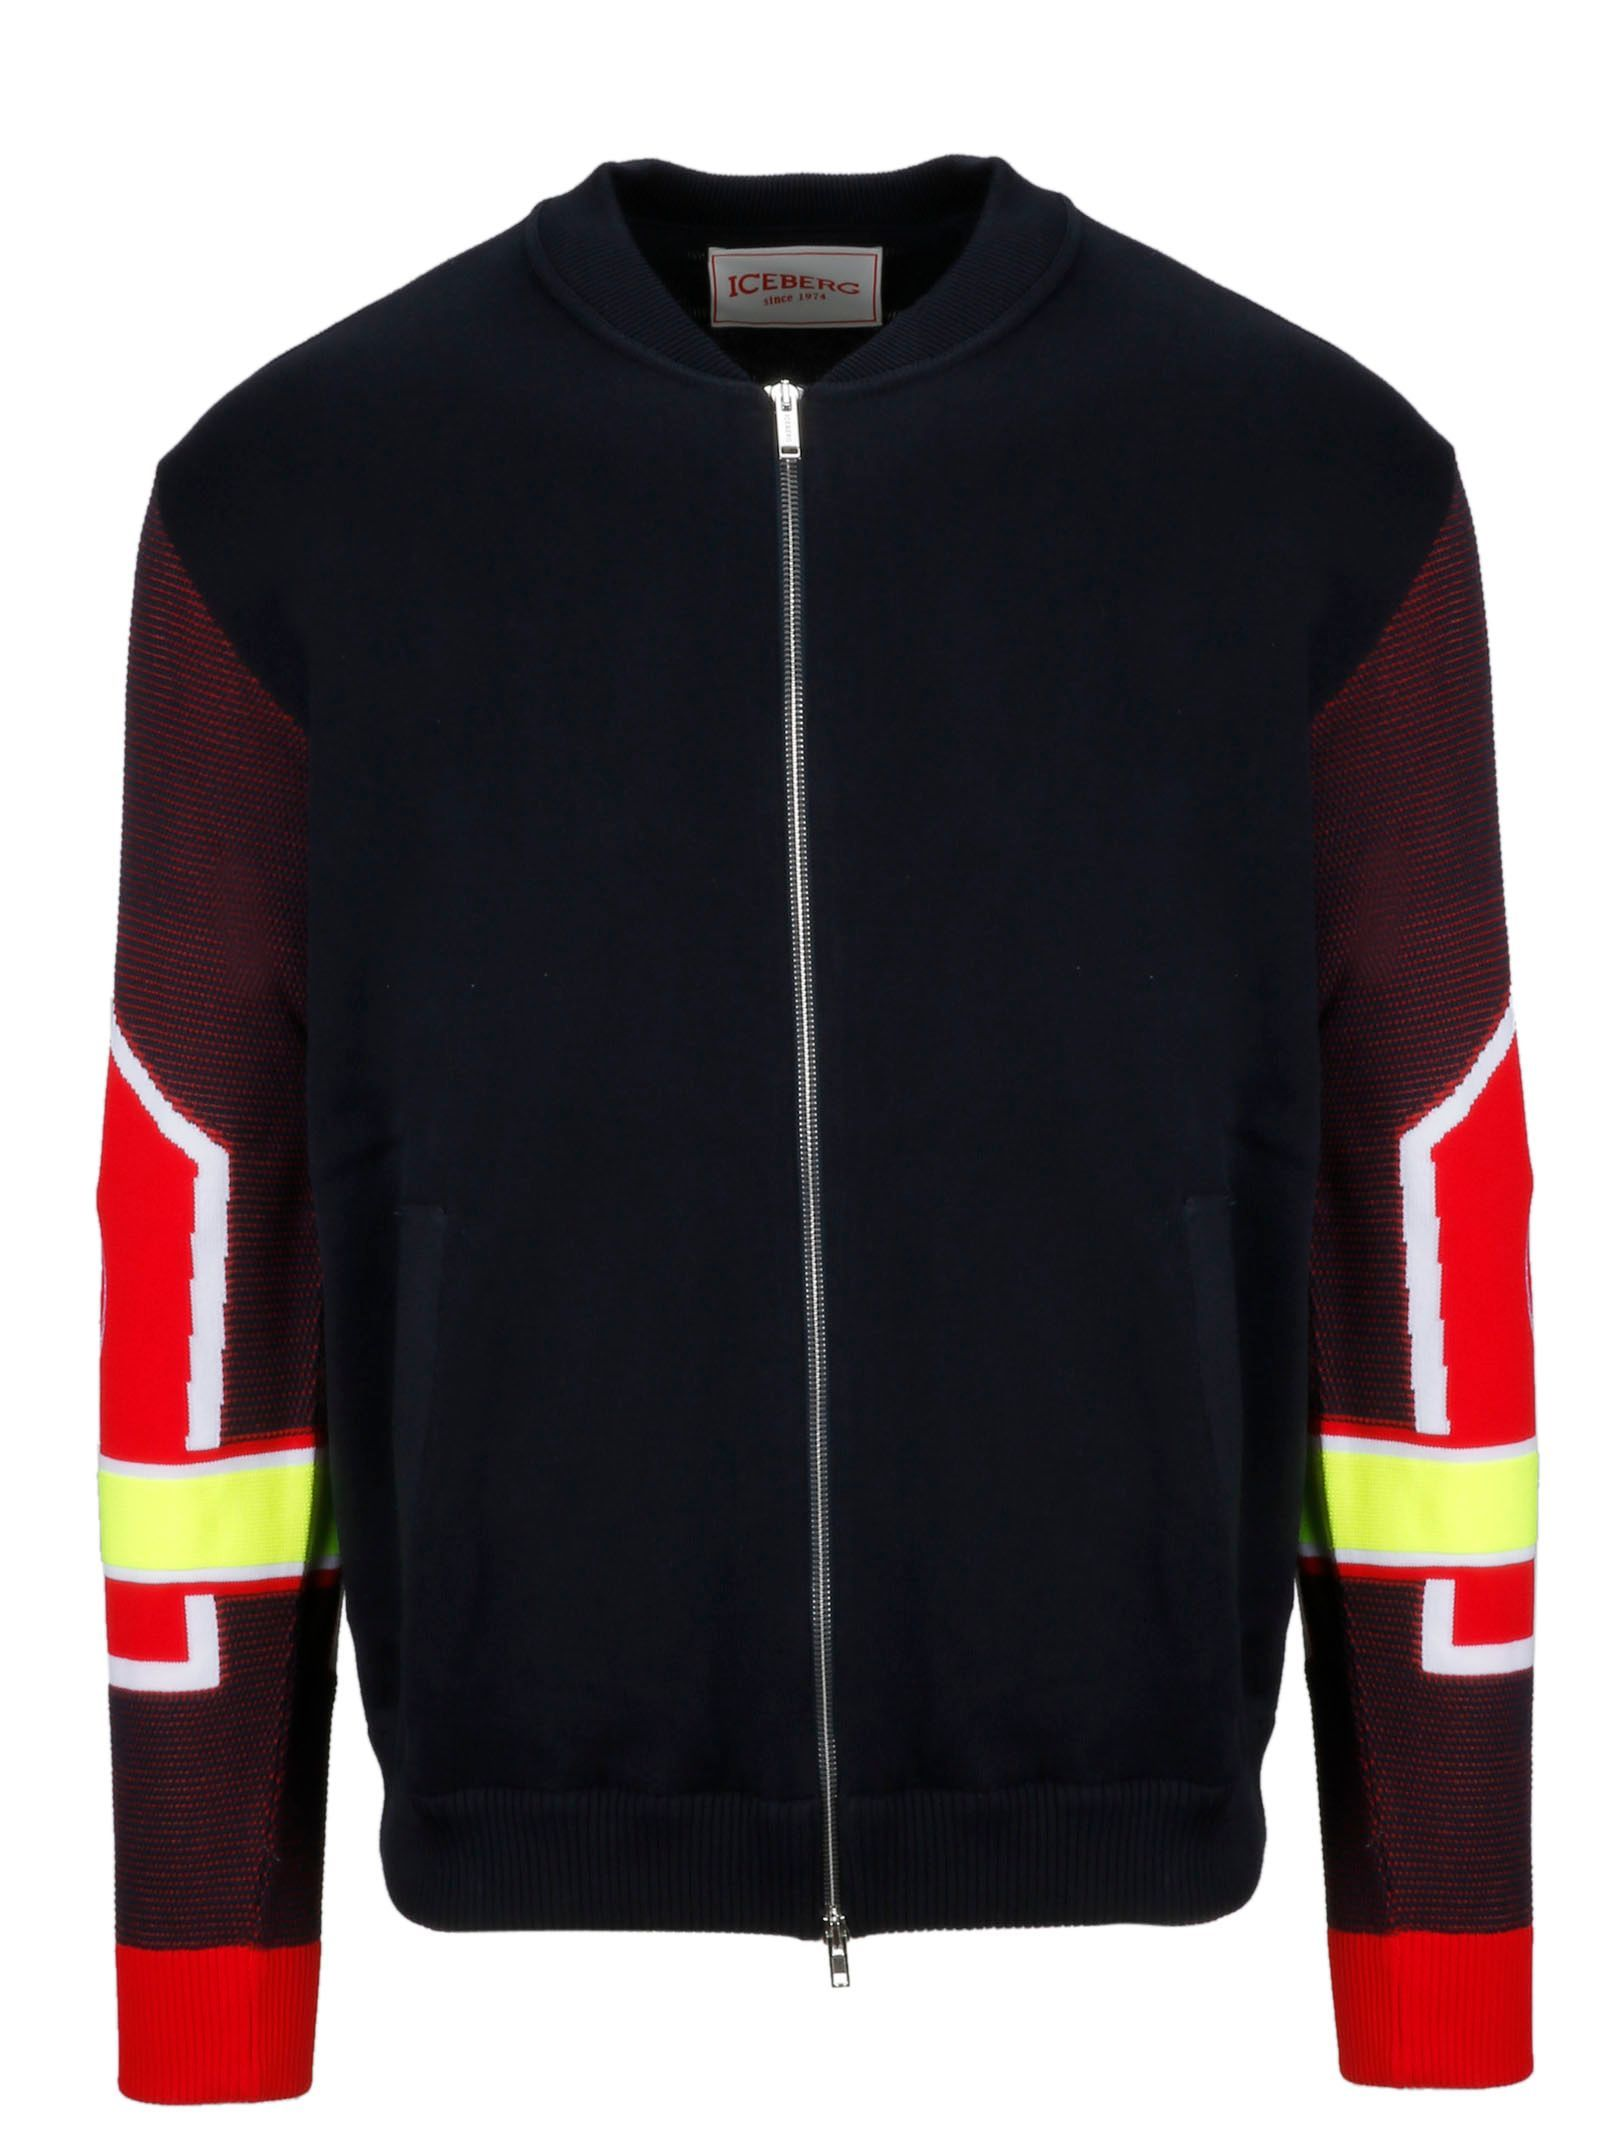 Iceberg Men S Ao0176046689 Black Cotton Sweatshirt Modesens Black Cotton Sweatshirt Cotton Sweatshirts Jackets [ 2133 x 1600 Pixel ]